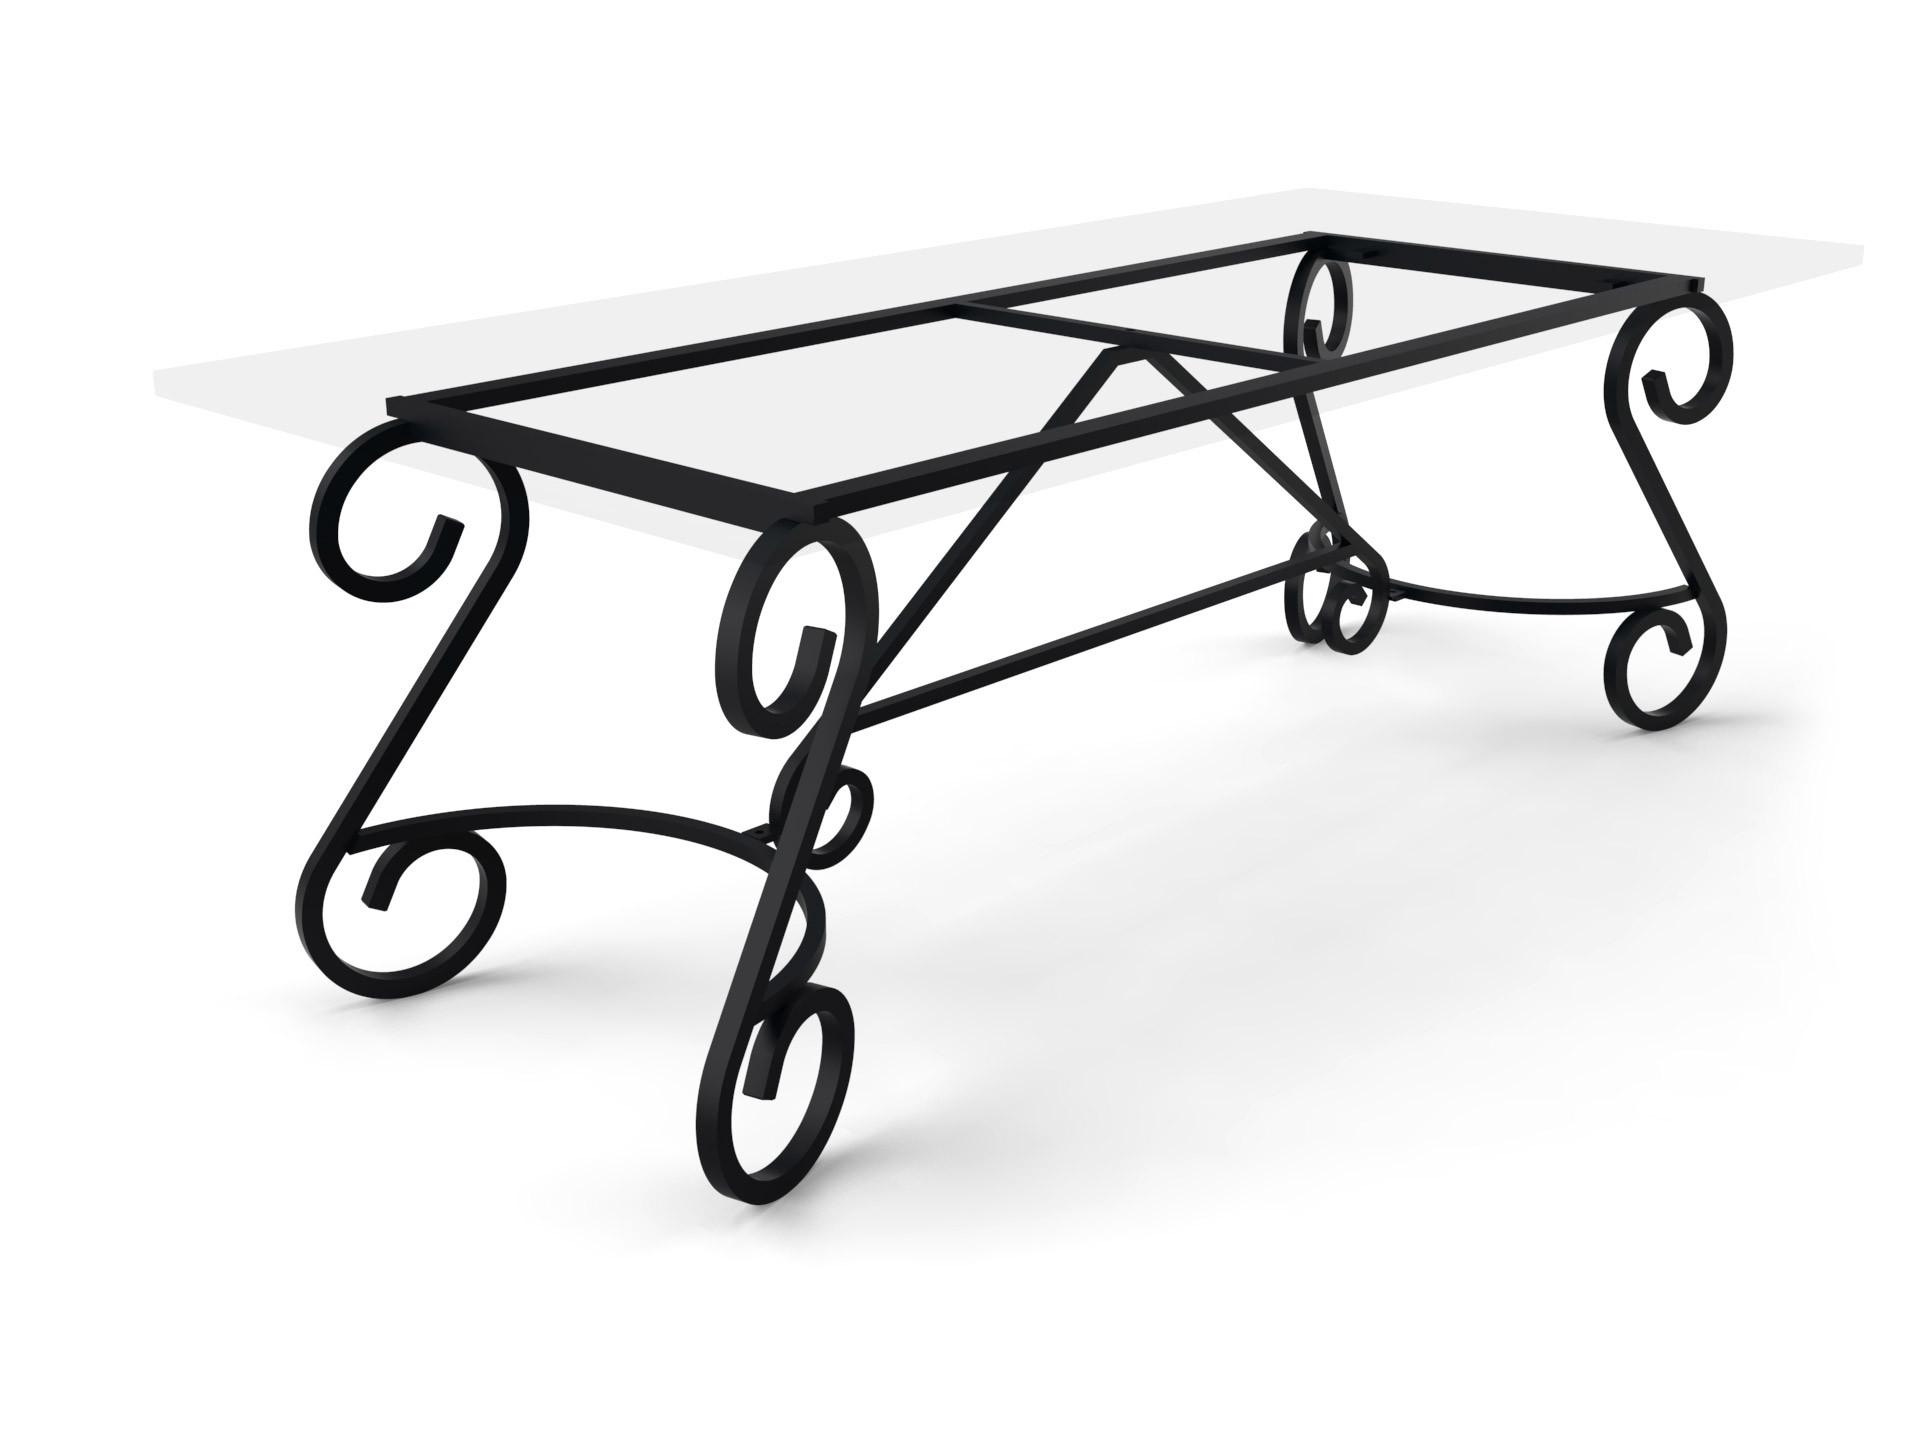 Tischgestell Bordeaux